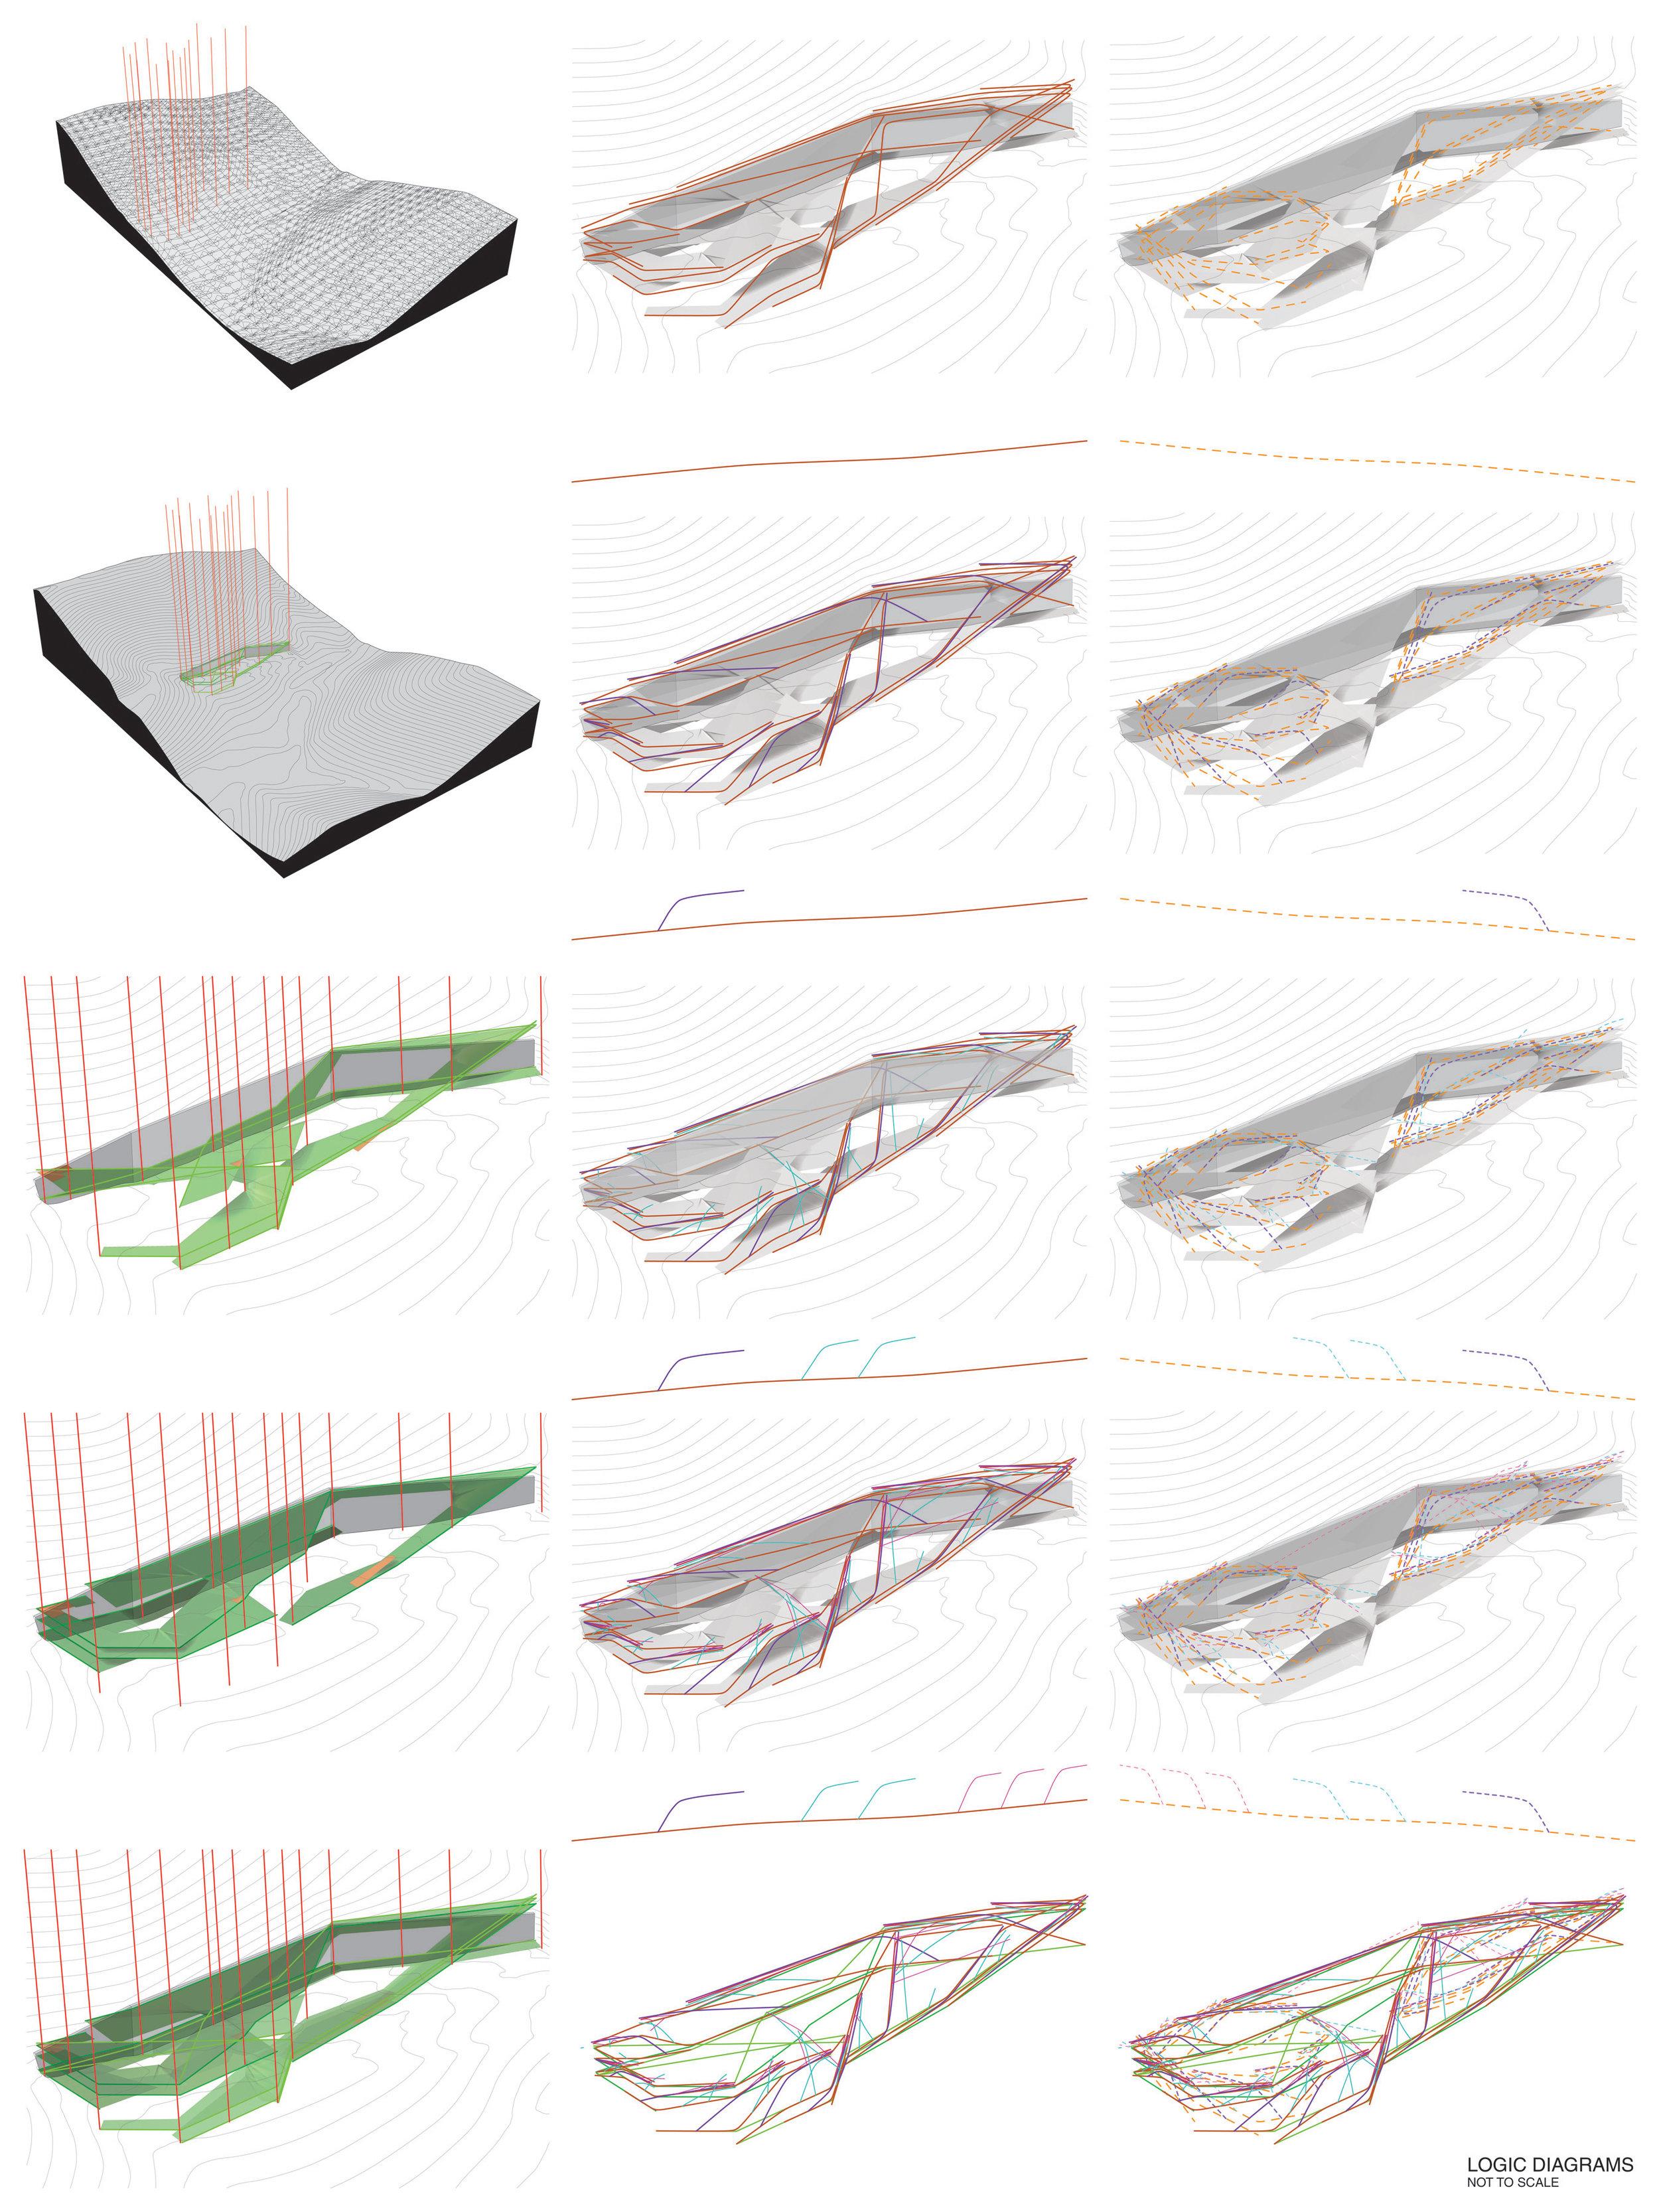 318_Ahrens_ChristopherTaurasi_SP13_Logic Diagram-01.jpg